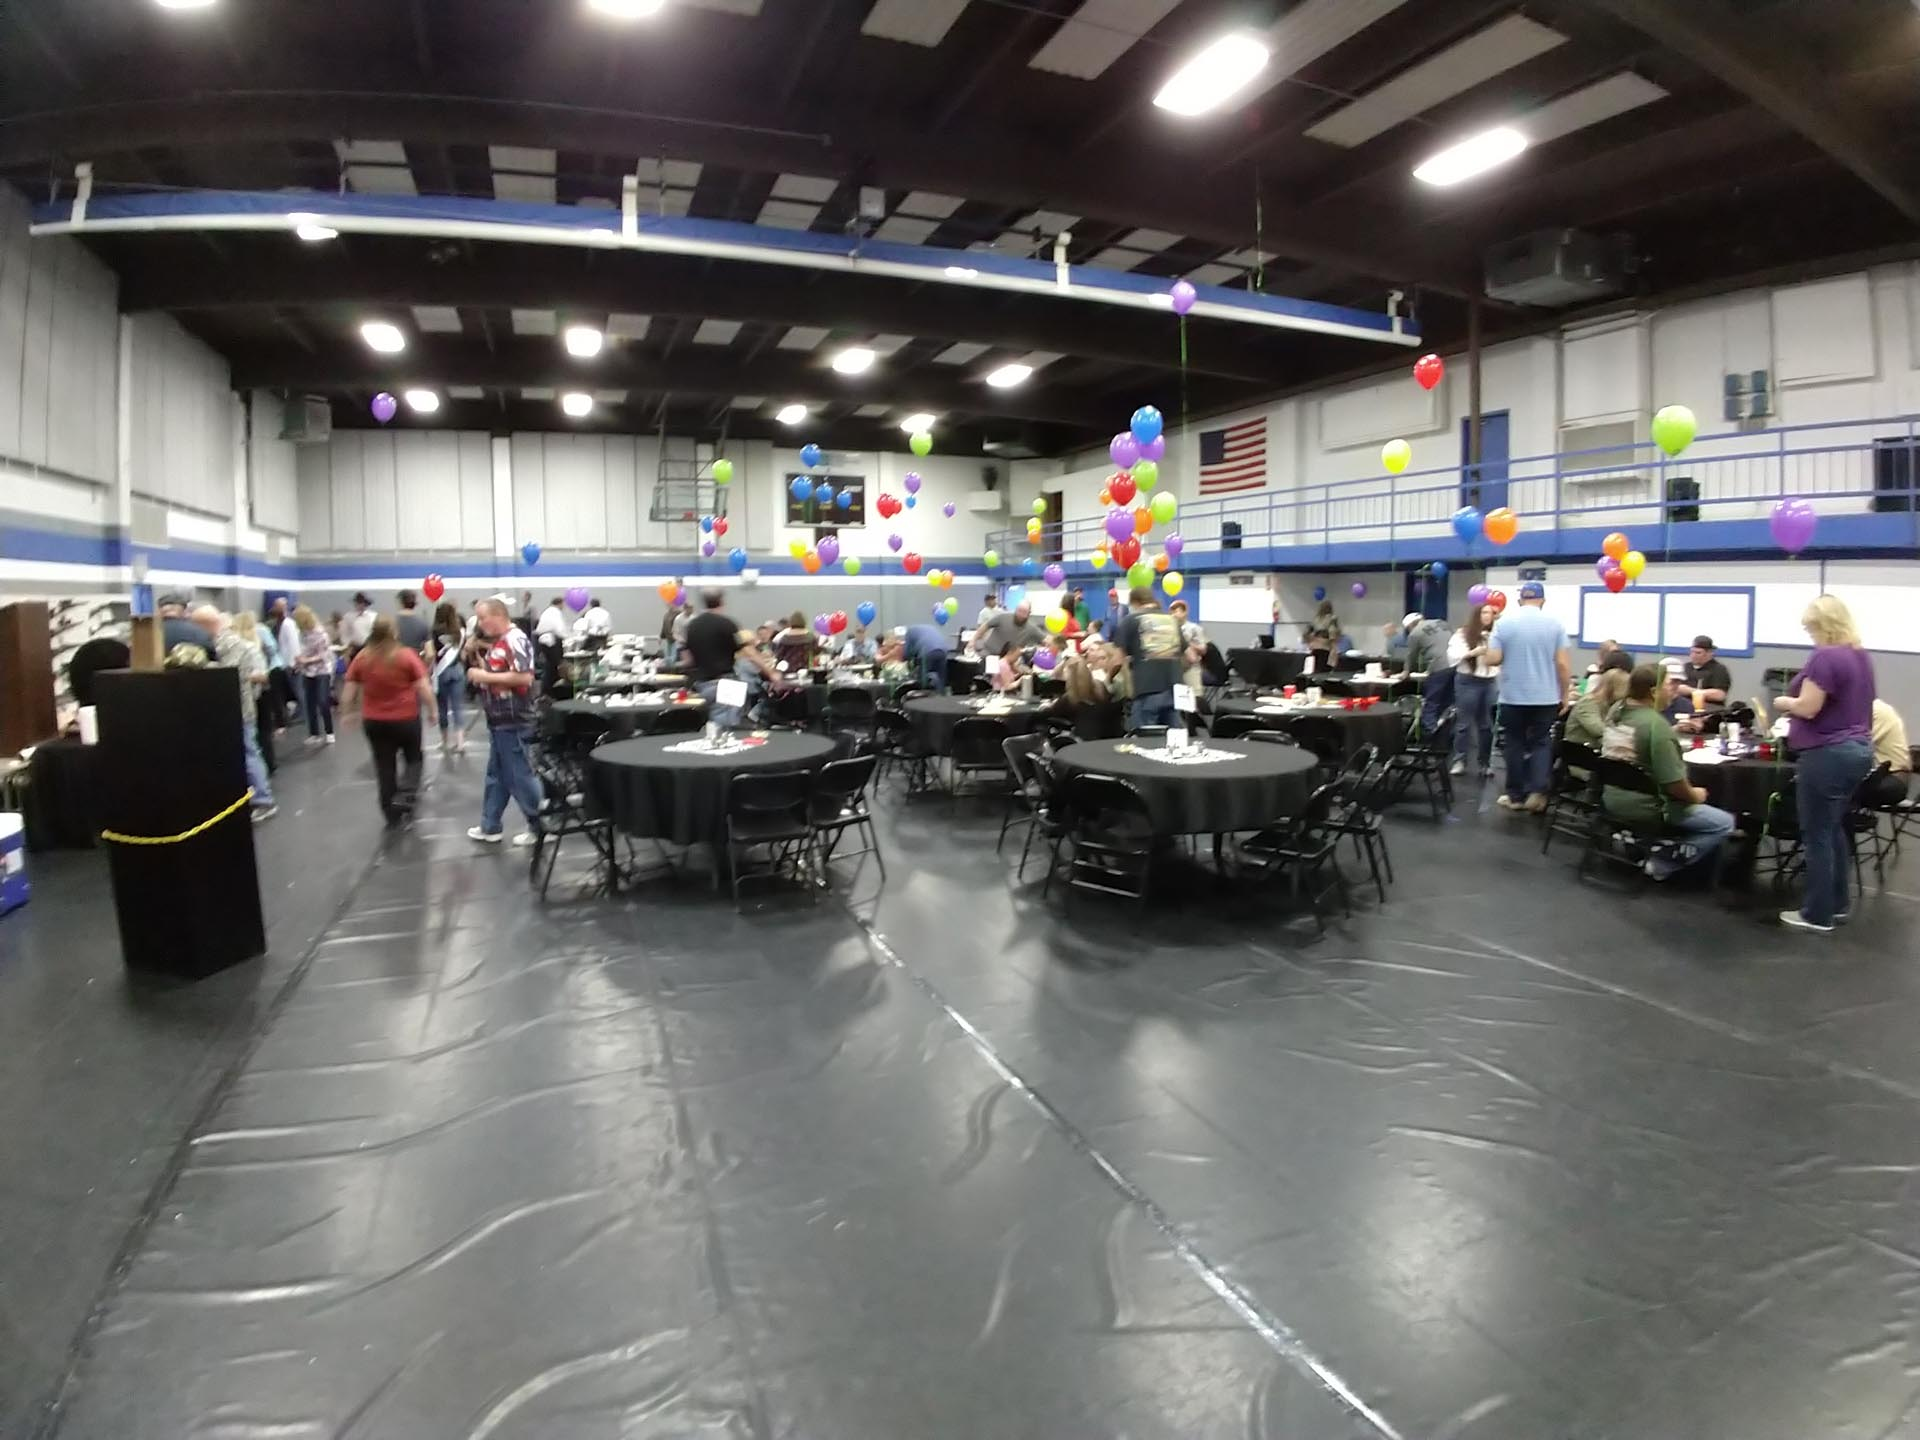 Banquet-2018-162818426